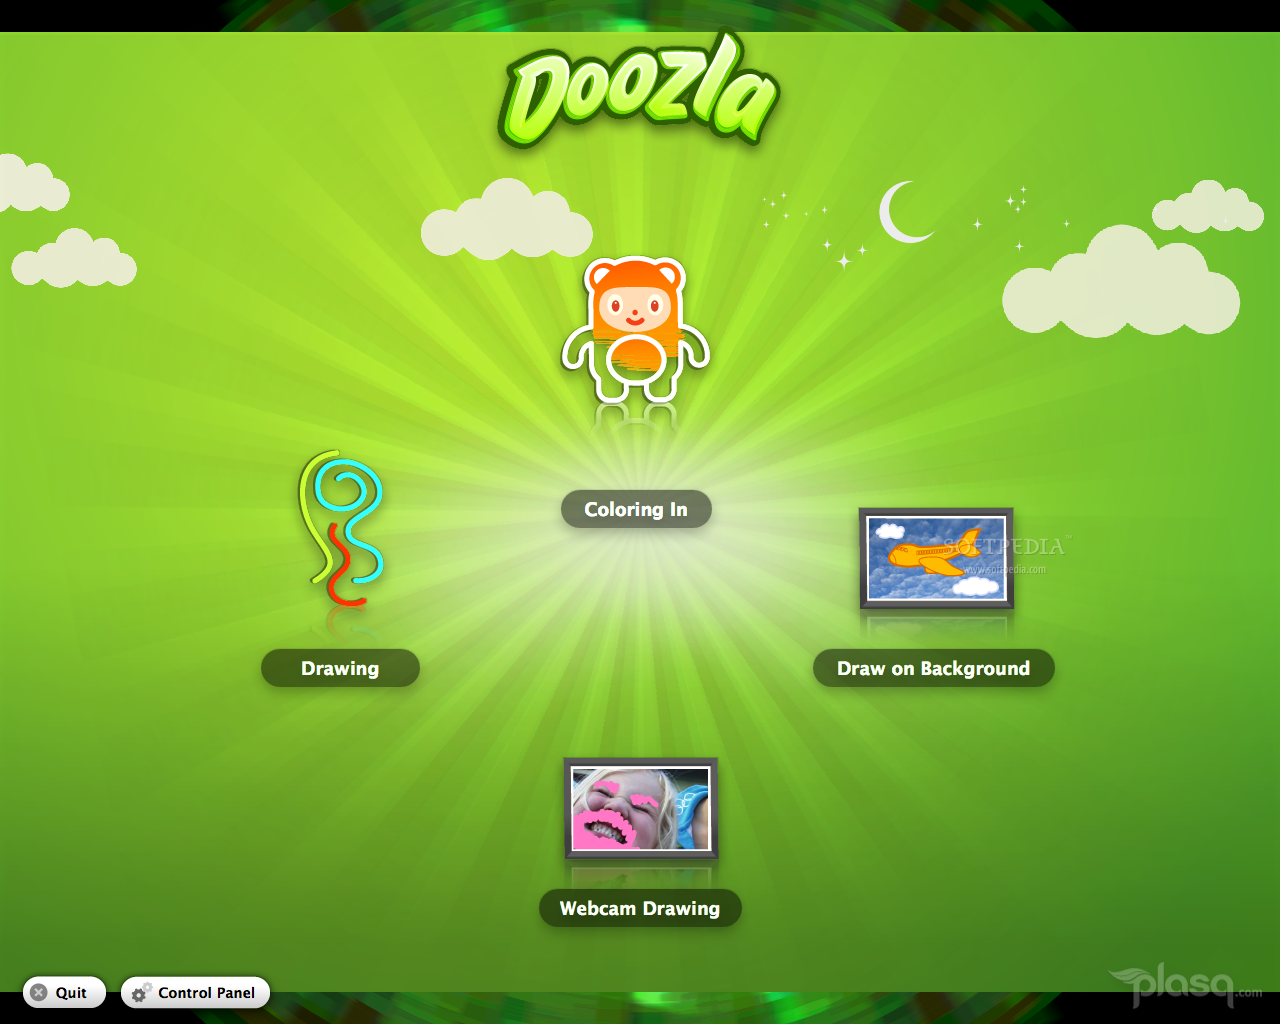 Doozla Kids 39 Drawing Tool Released For Mac Softpedia